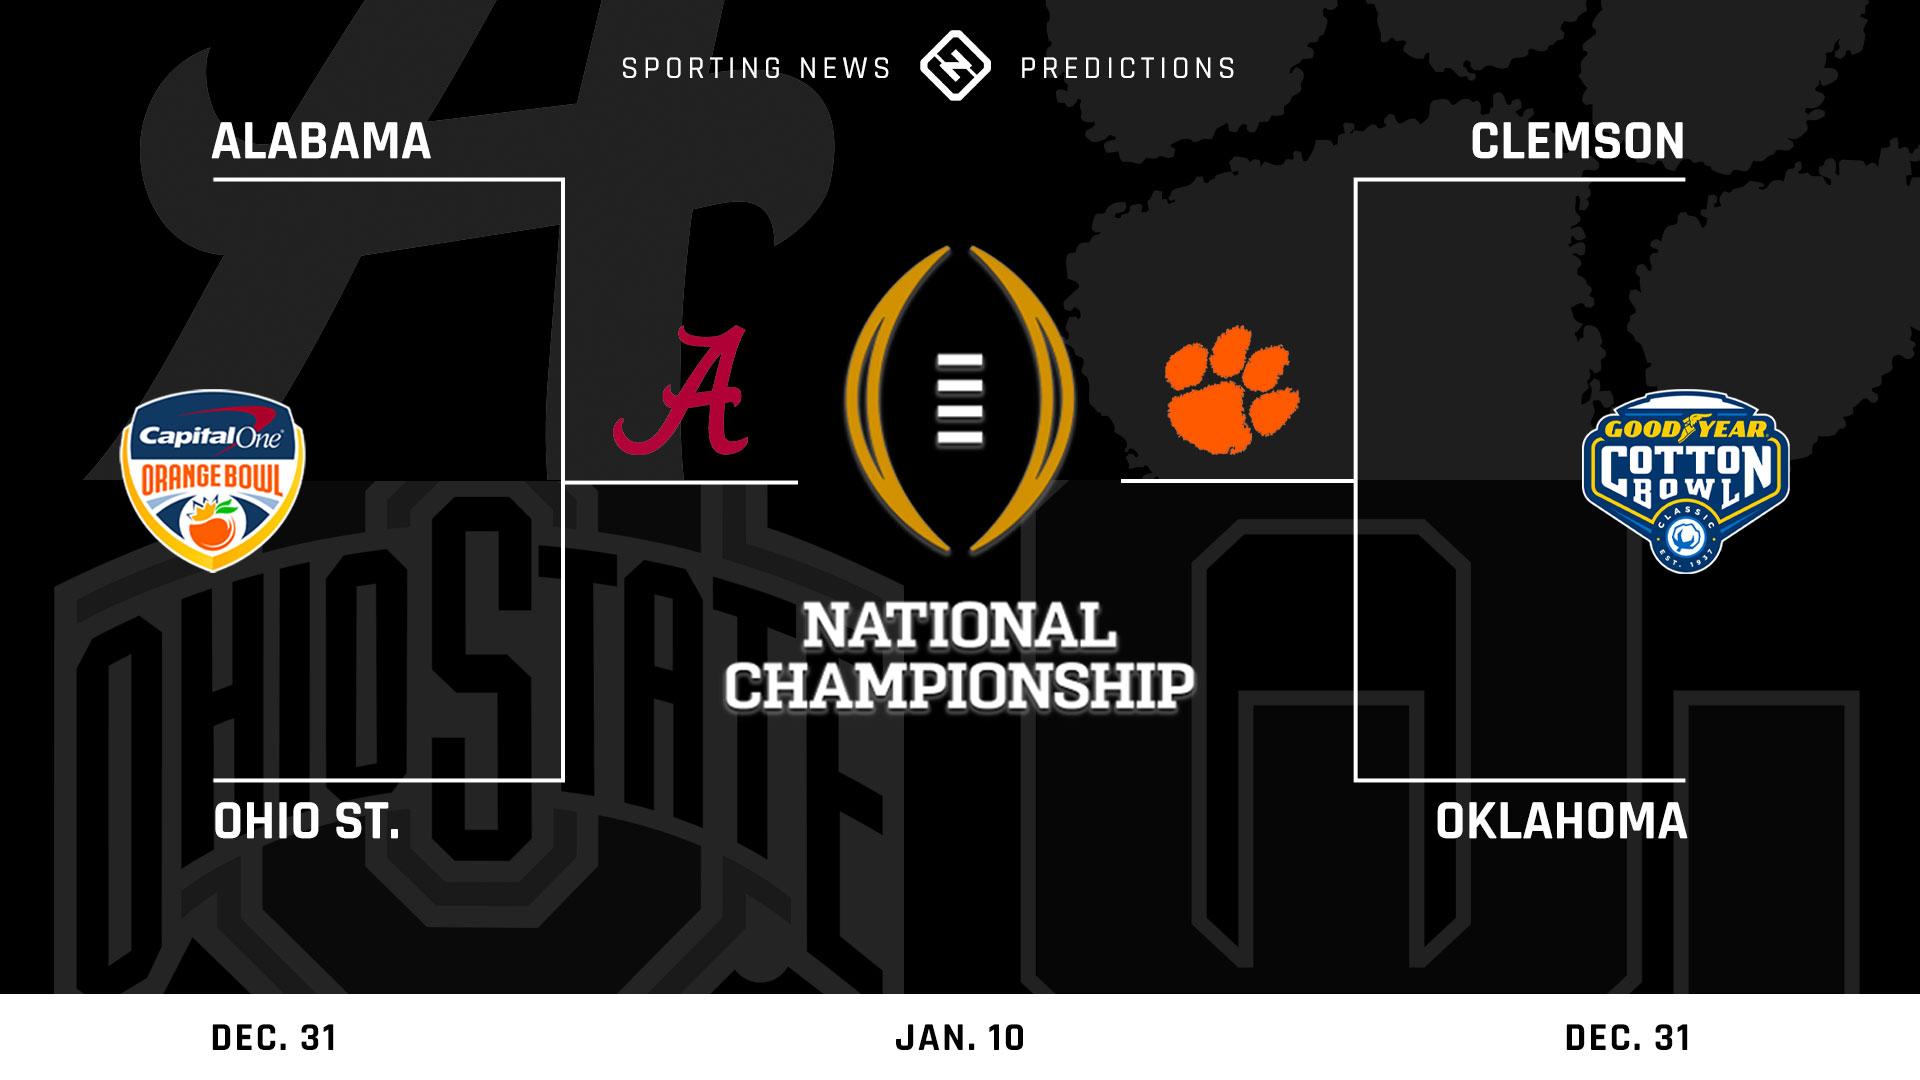 University football predictions for 2021 bowling, finals, national championship